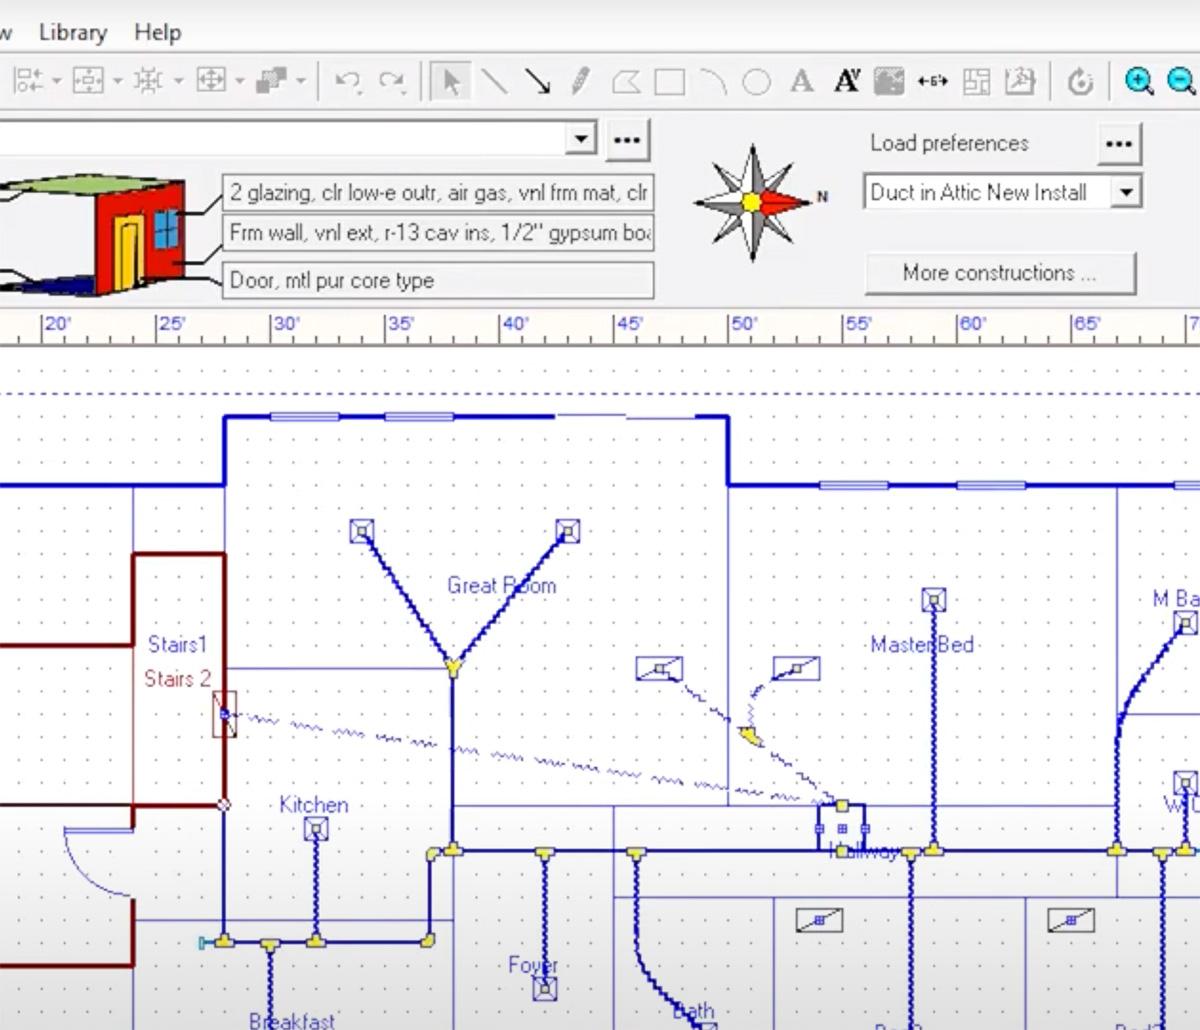 MiTek HVAC Design Services - Screenshot of HVAC Design software